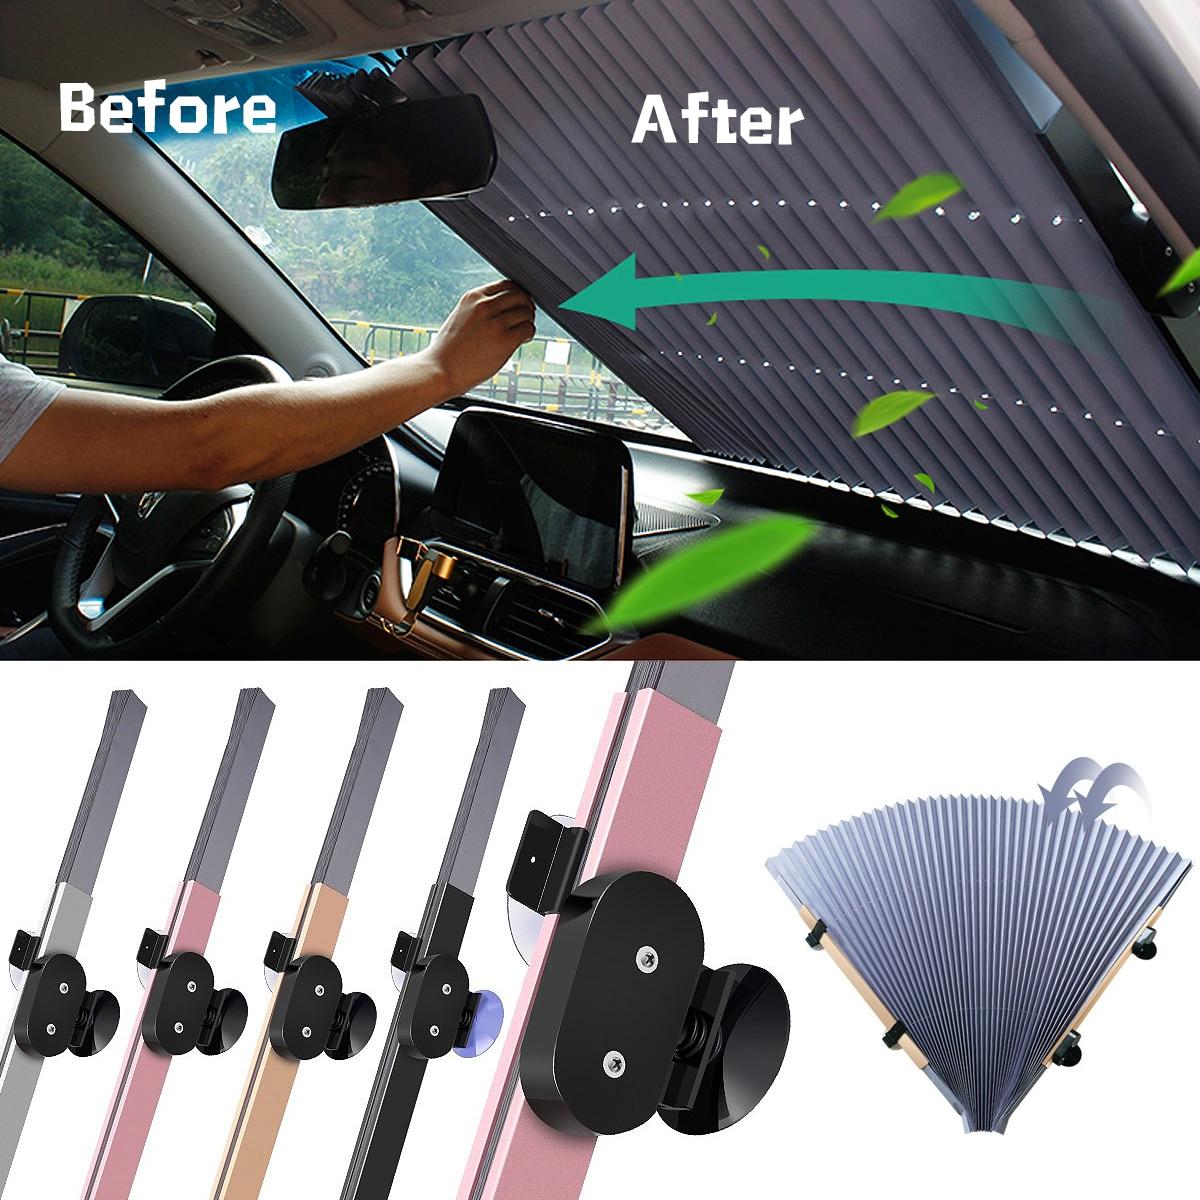 70*155CM Car Retractable Windshield Sun Shade Block Sunshade Cover Front/Rear Window Foil Curtain for Solar UV Protect Sunshades